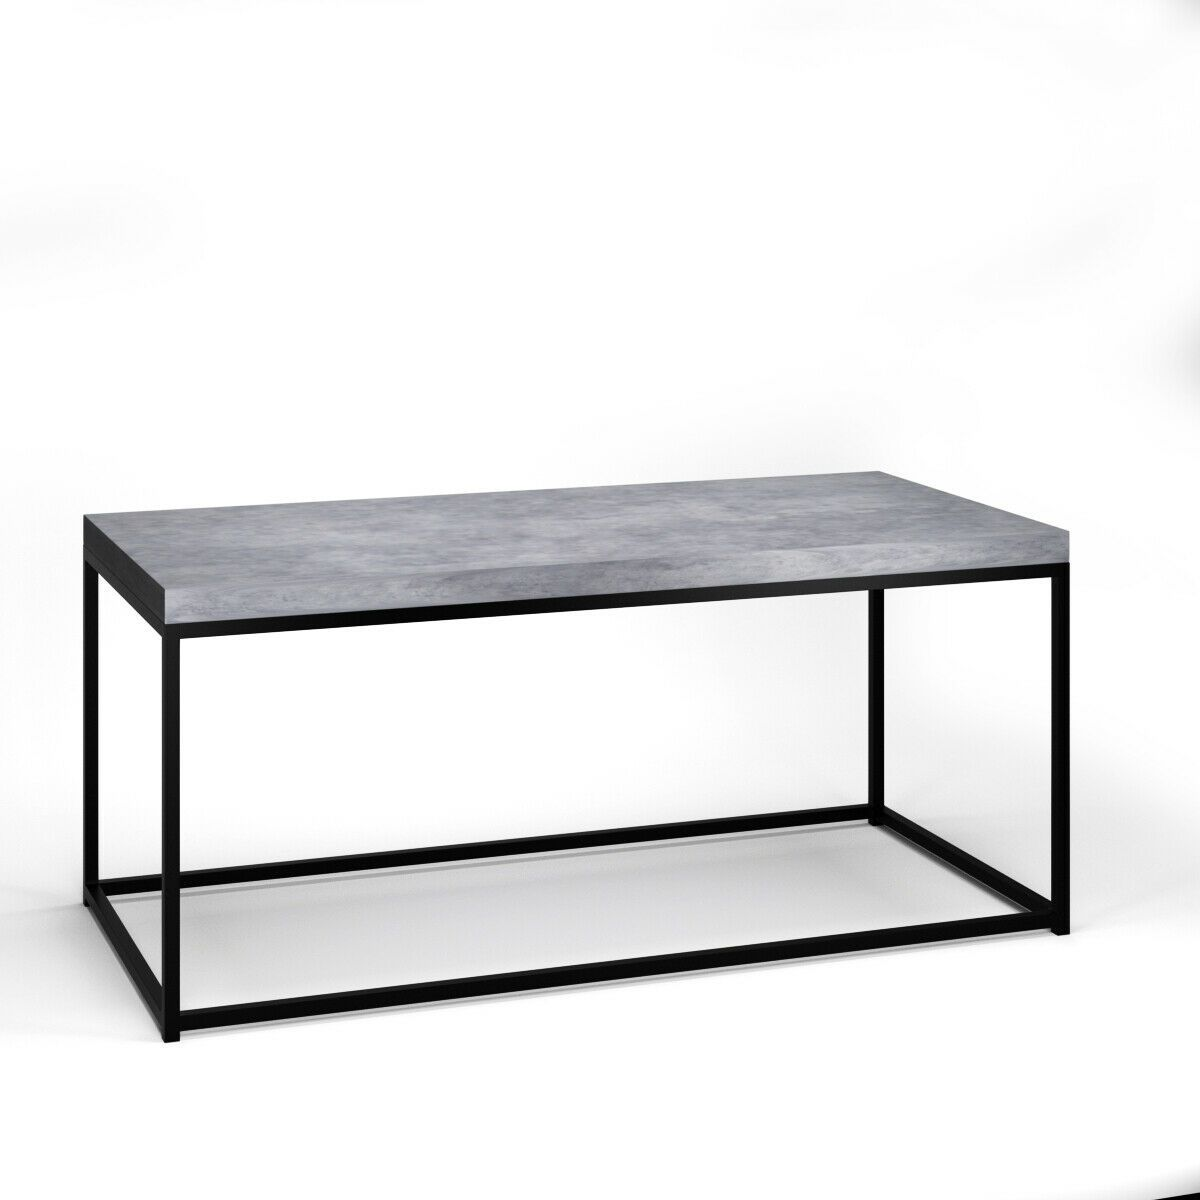 Gymax Modern Rectangular Cocktail Coffee Table Metal Frame Living Room Furniture Walmart Com Metal Coffee Table Coffee Table Coffee Table Metal Frame [ 1200 x 1200 Pixel ]